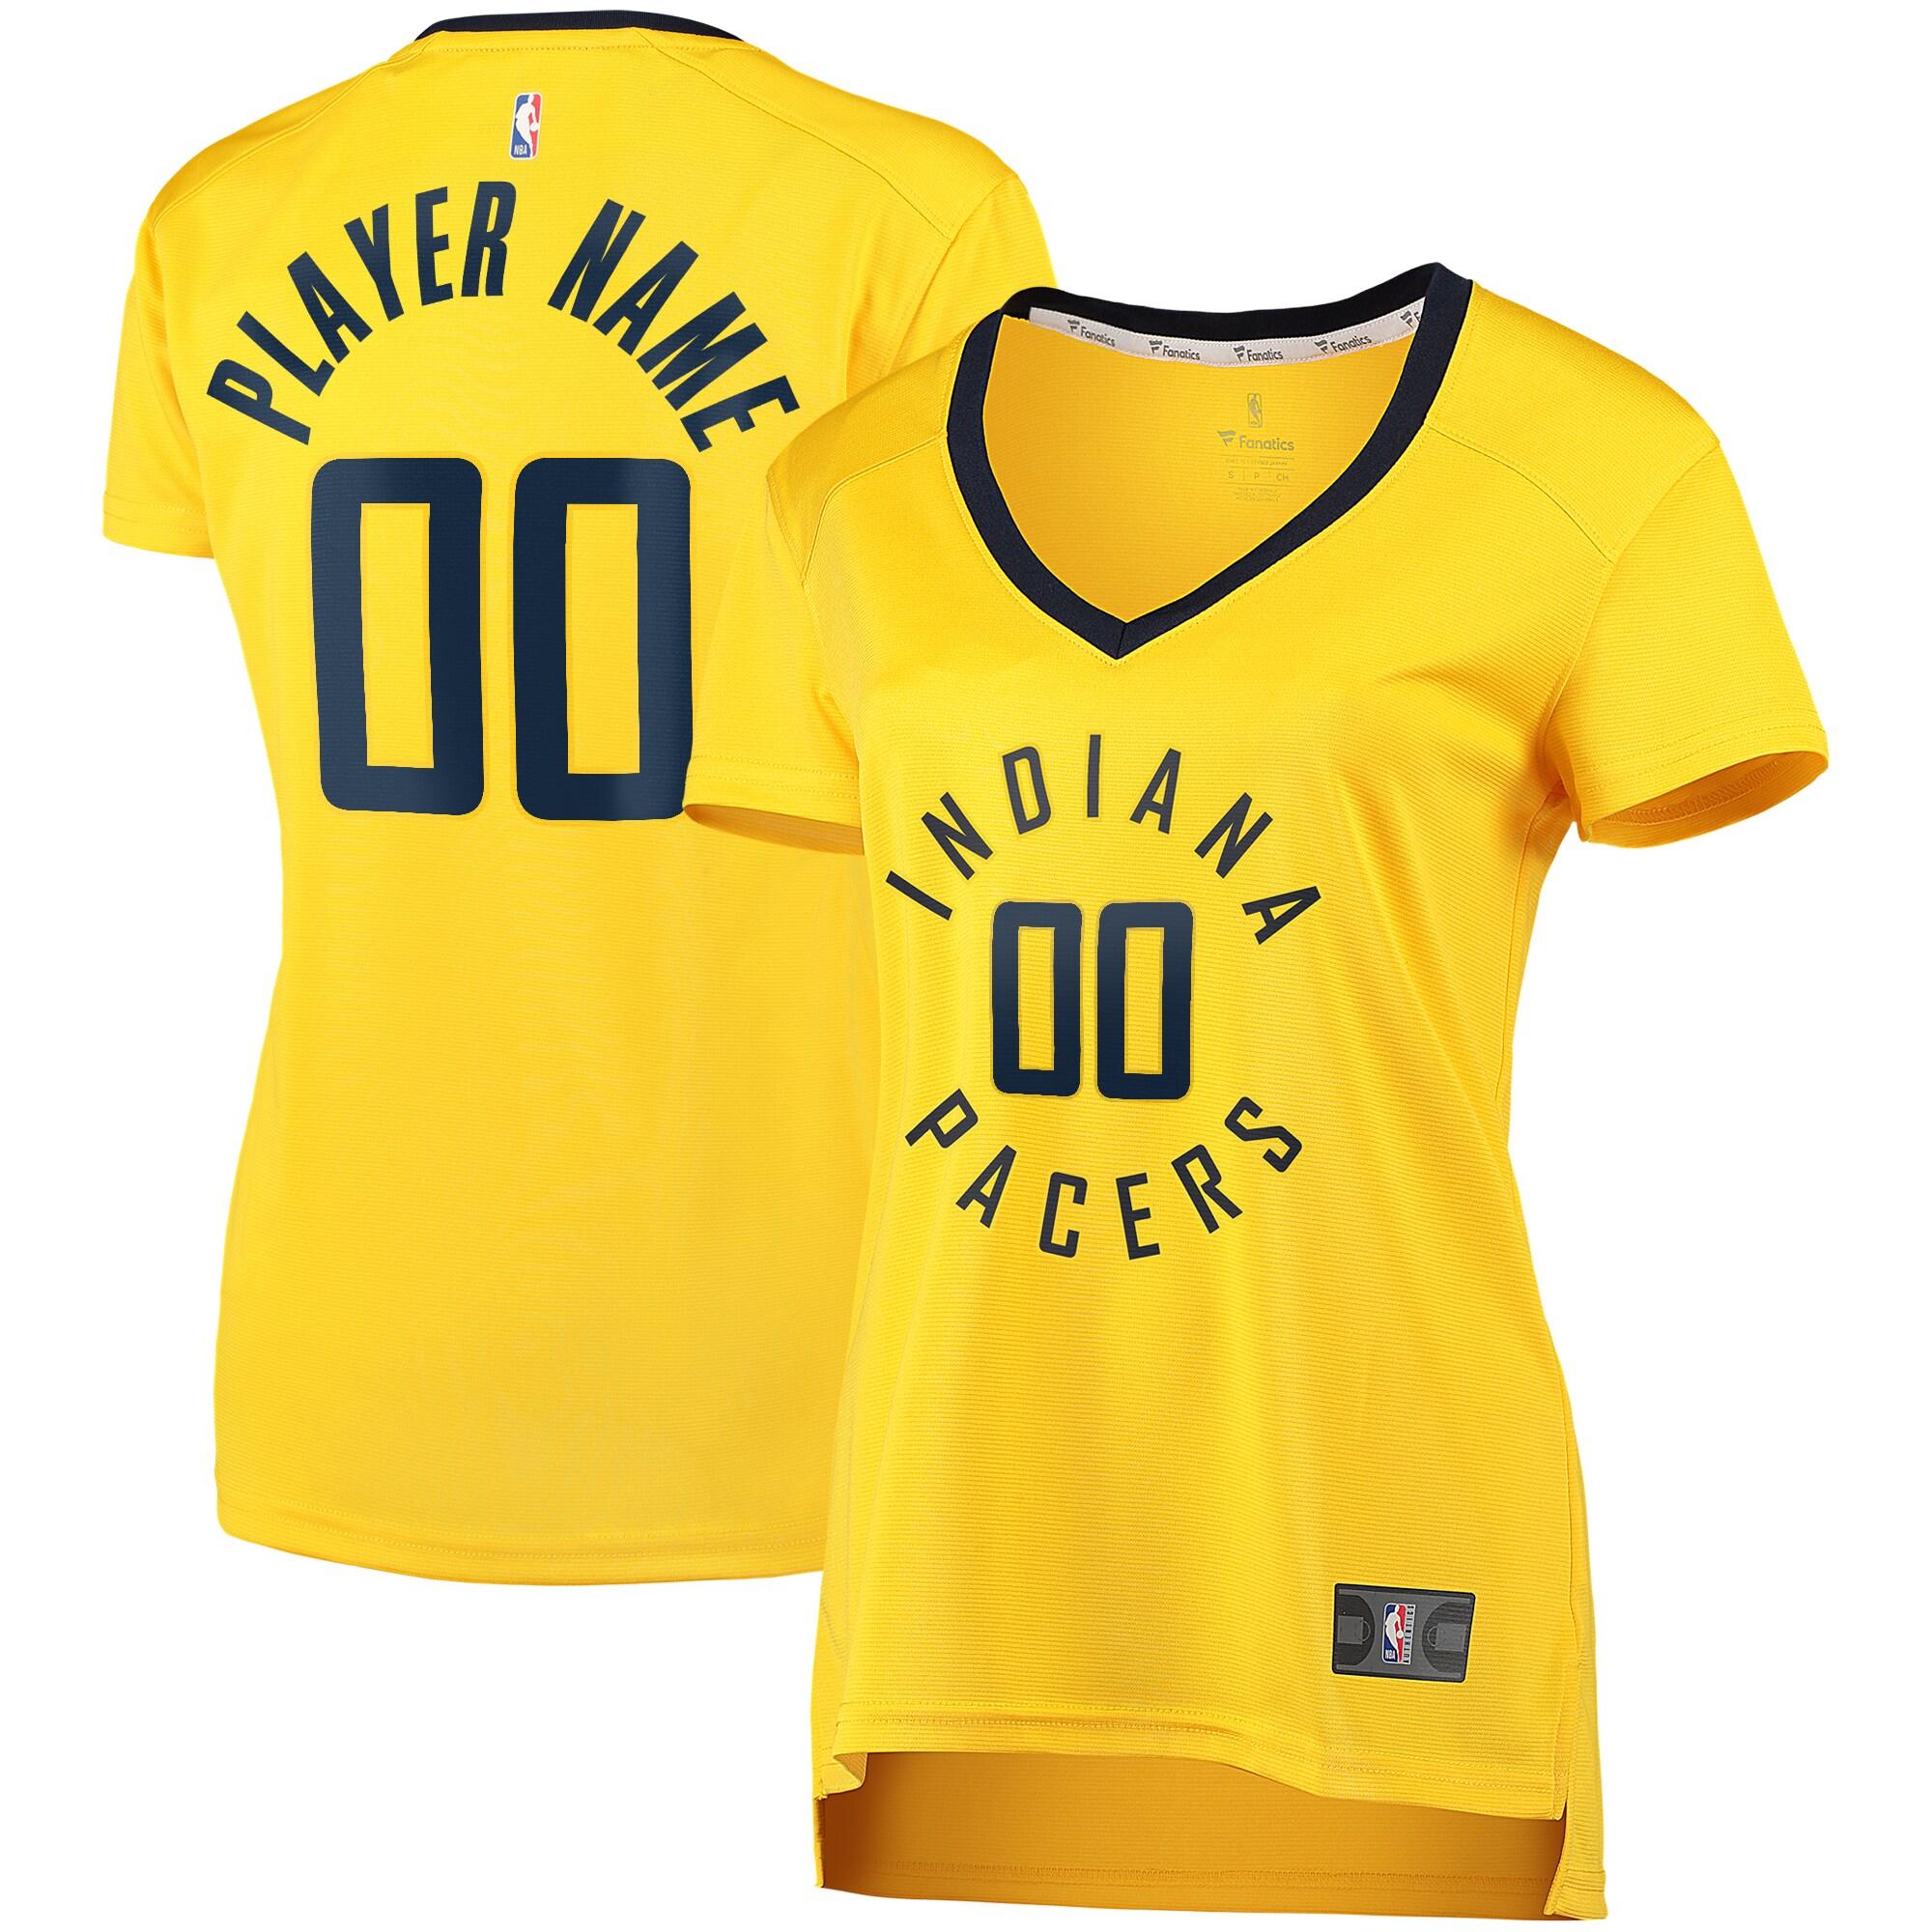 Indiana Pacers Fanatics Branded Women's Fast Break Replica Custom Jersey Gold - Statement Edition